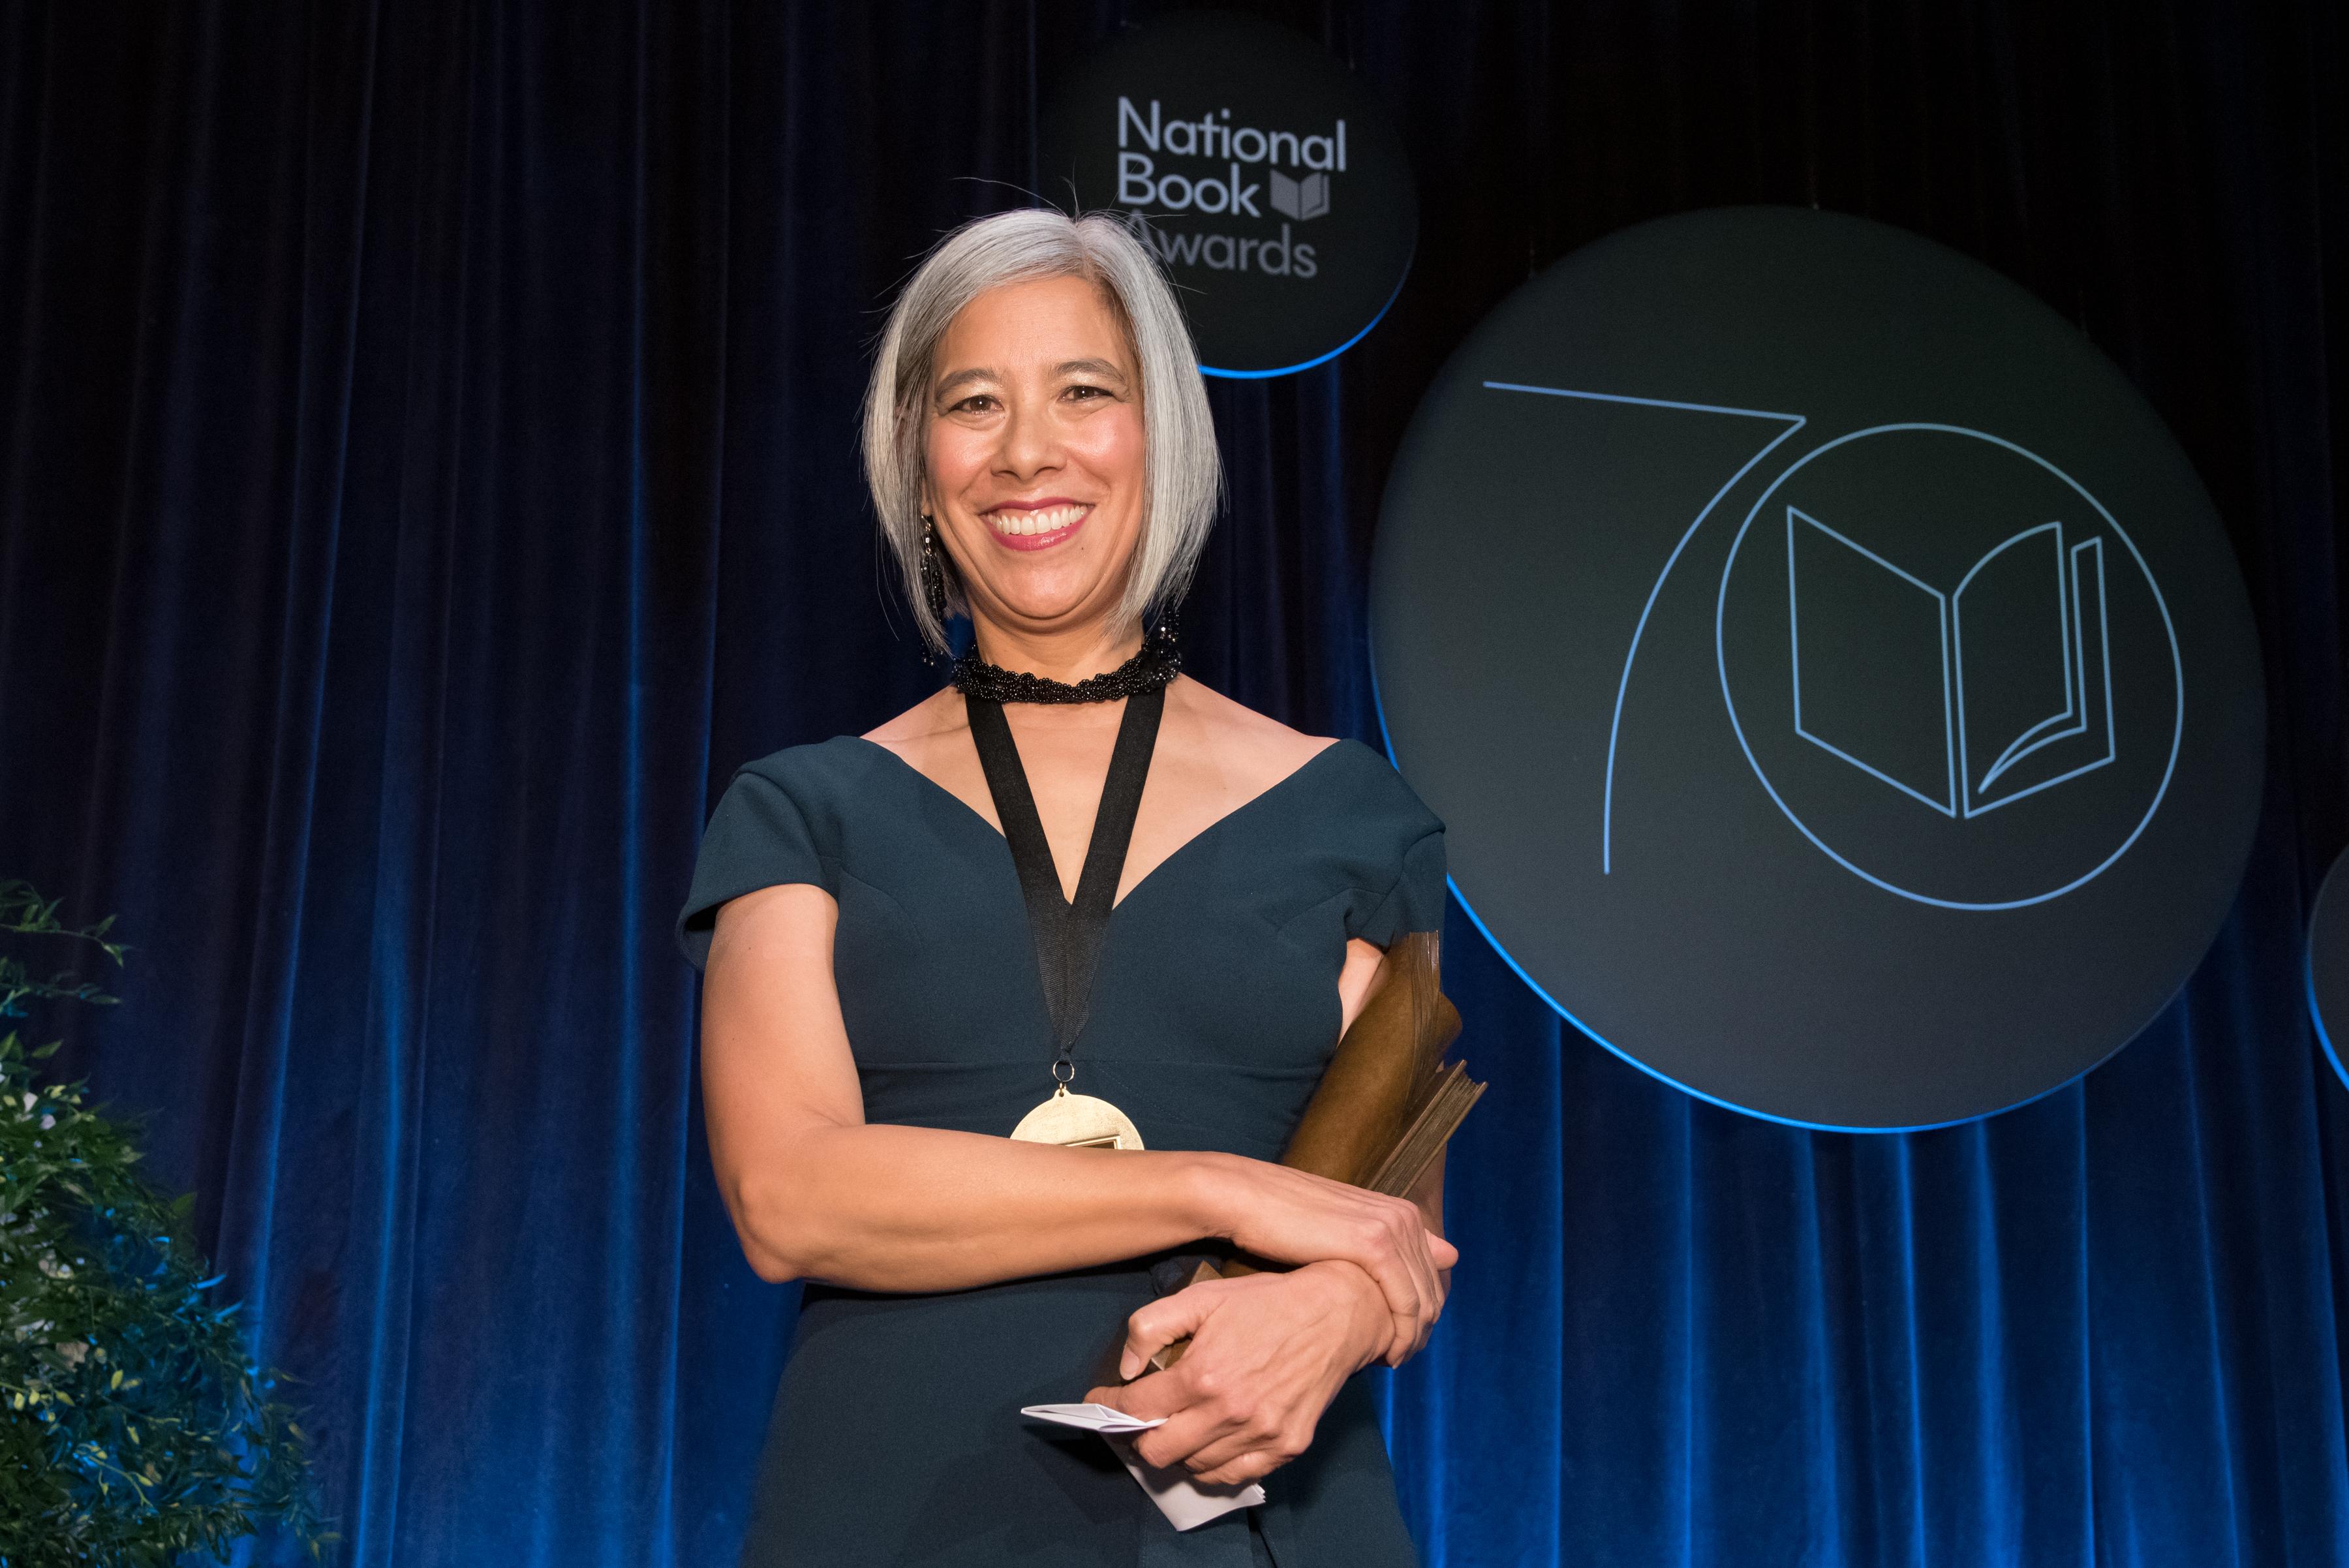 Susan Choi, Sarah M. Broom Honored at 70th Annual National Book Awards